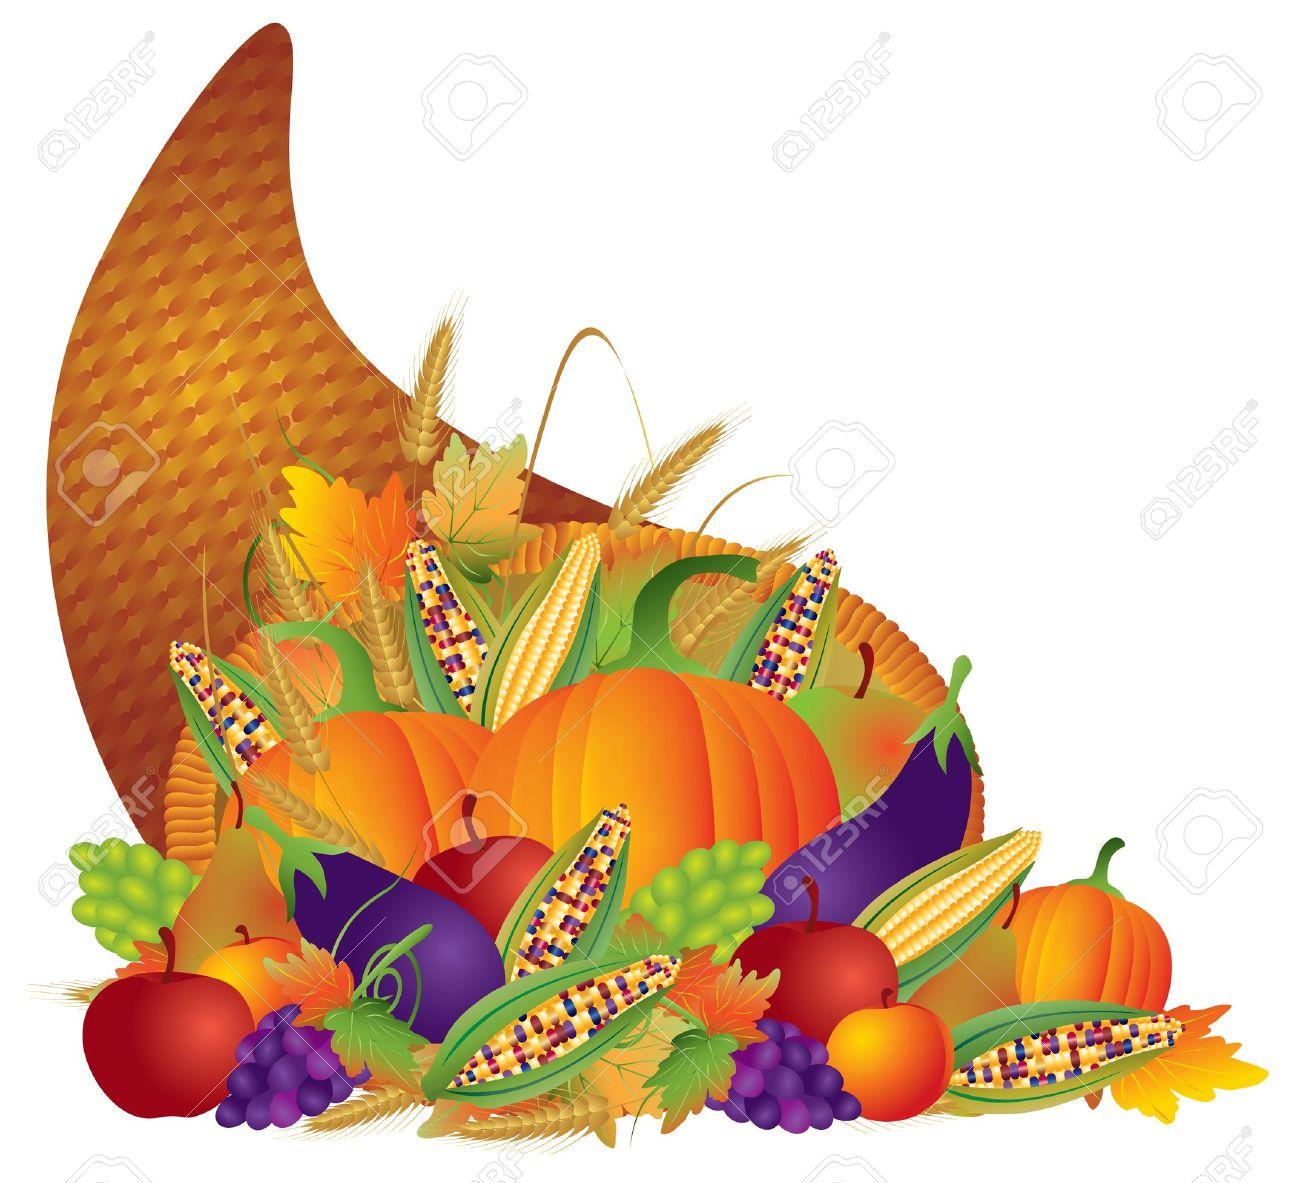 1300x1183 Cornucopia Clipart Fruits And Vegetable